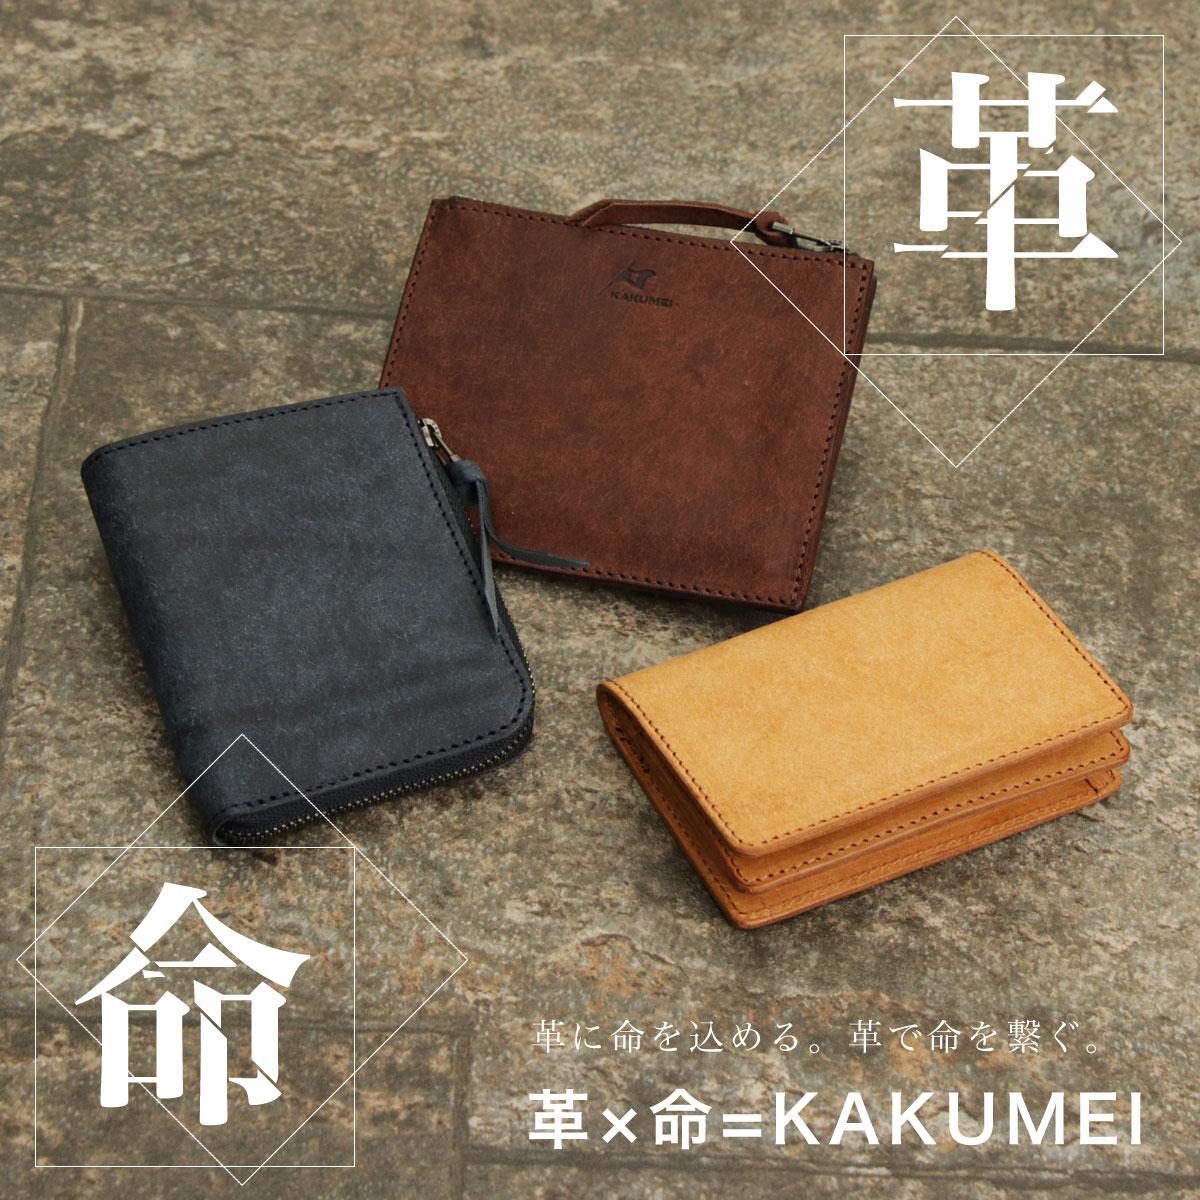 KAKUMEI カクメイ PETANCA ペタンカ 機能的極薄財布 薄い財布 小さい財布 ミニ財布 極小財布 日本製 本革 プエブロ イタリアンレザー PUEBLO フルレザー  革命